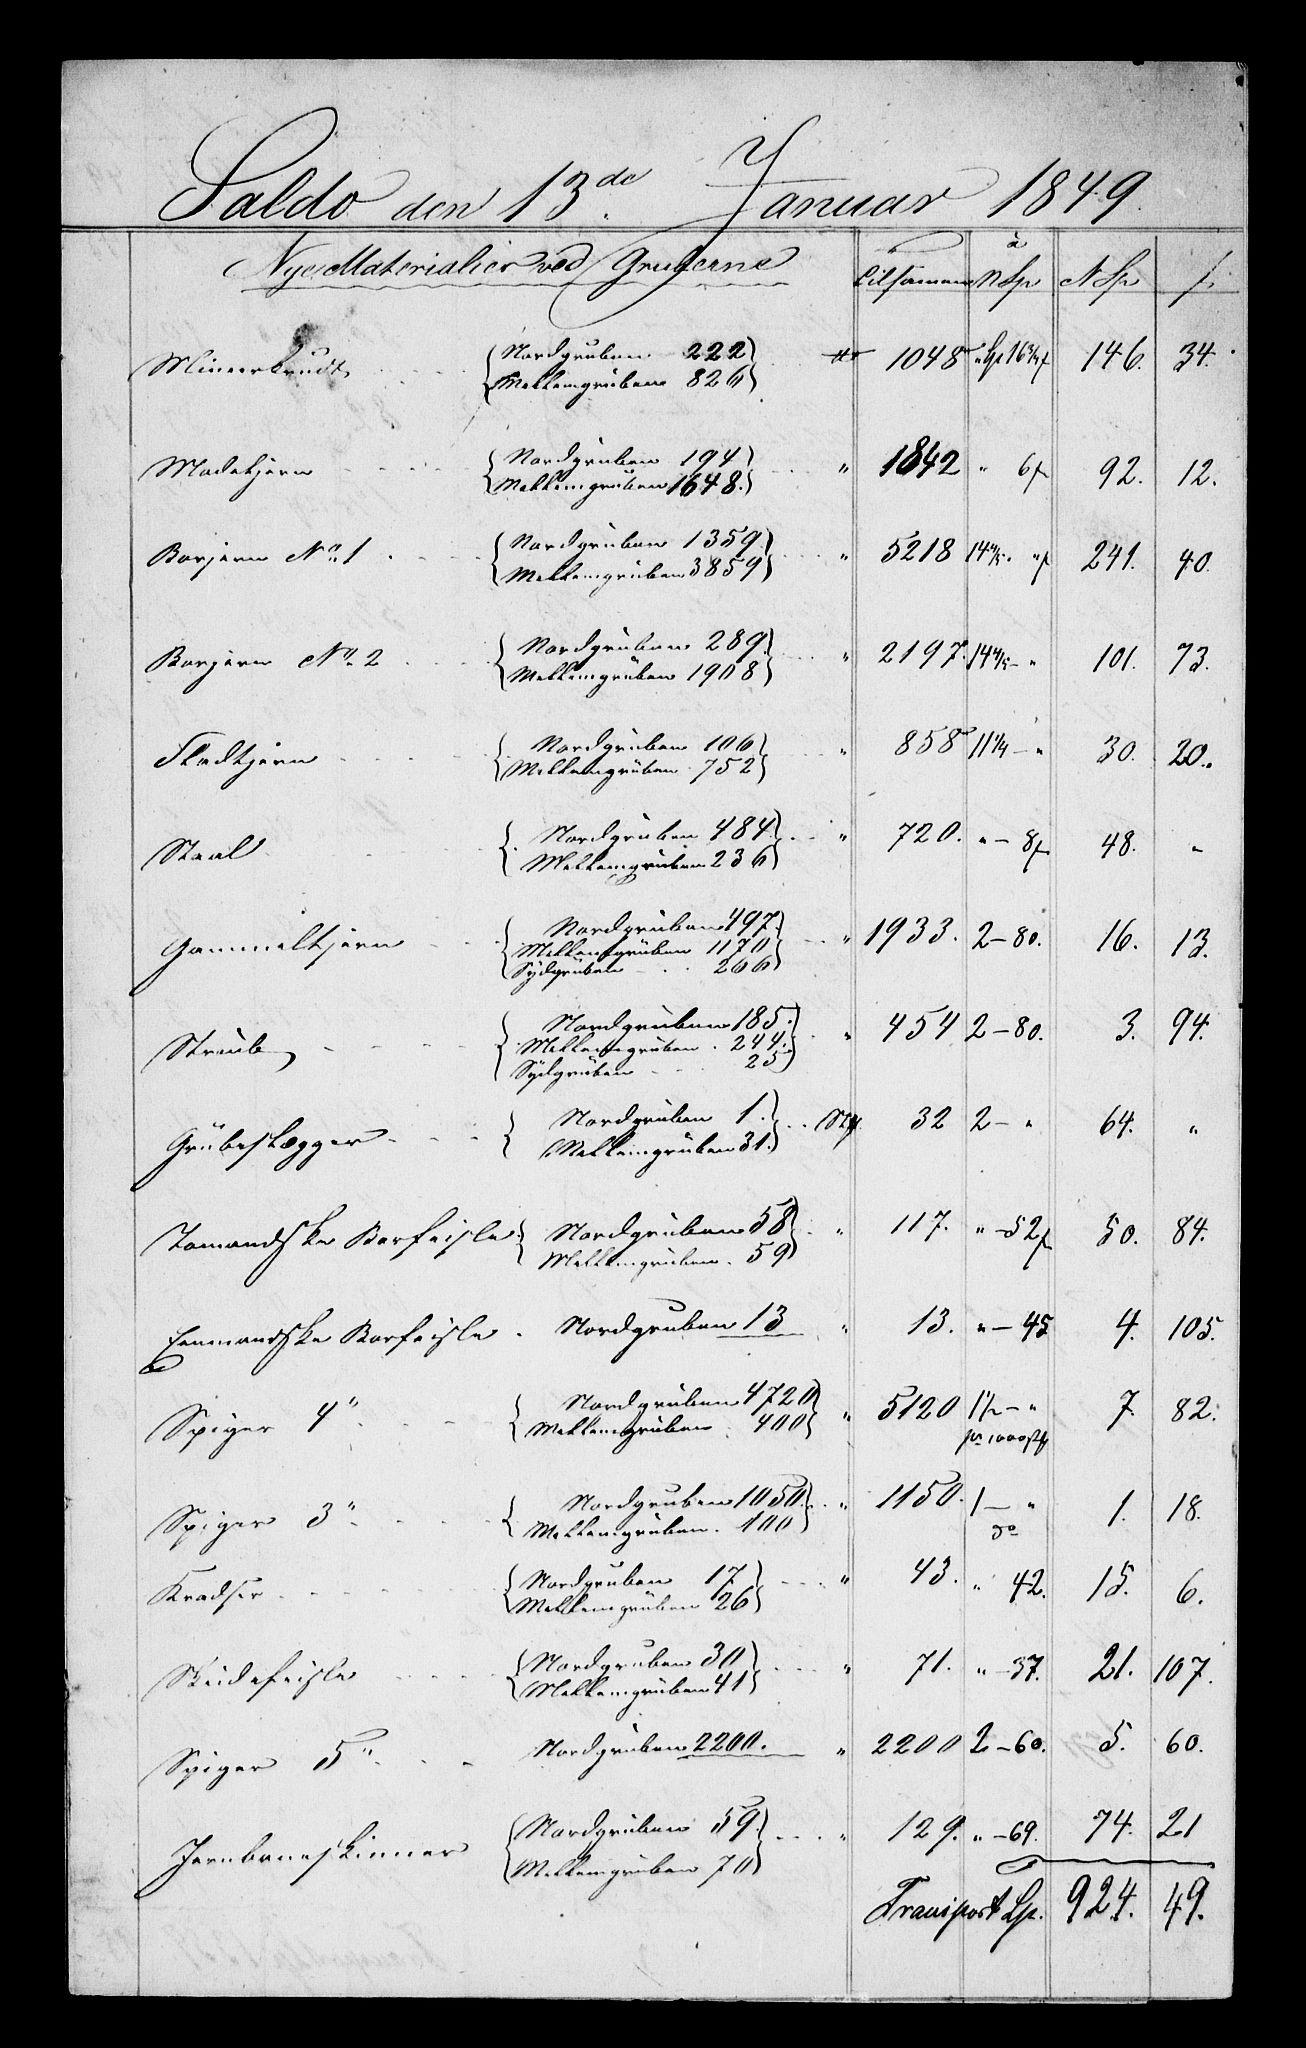 RA, Modums Blaafarveværk, G/Gd/Gdc/L0212, 1822-1849, s. 2